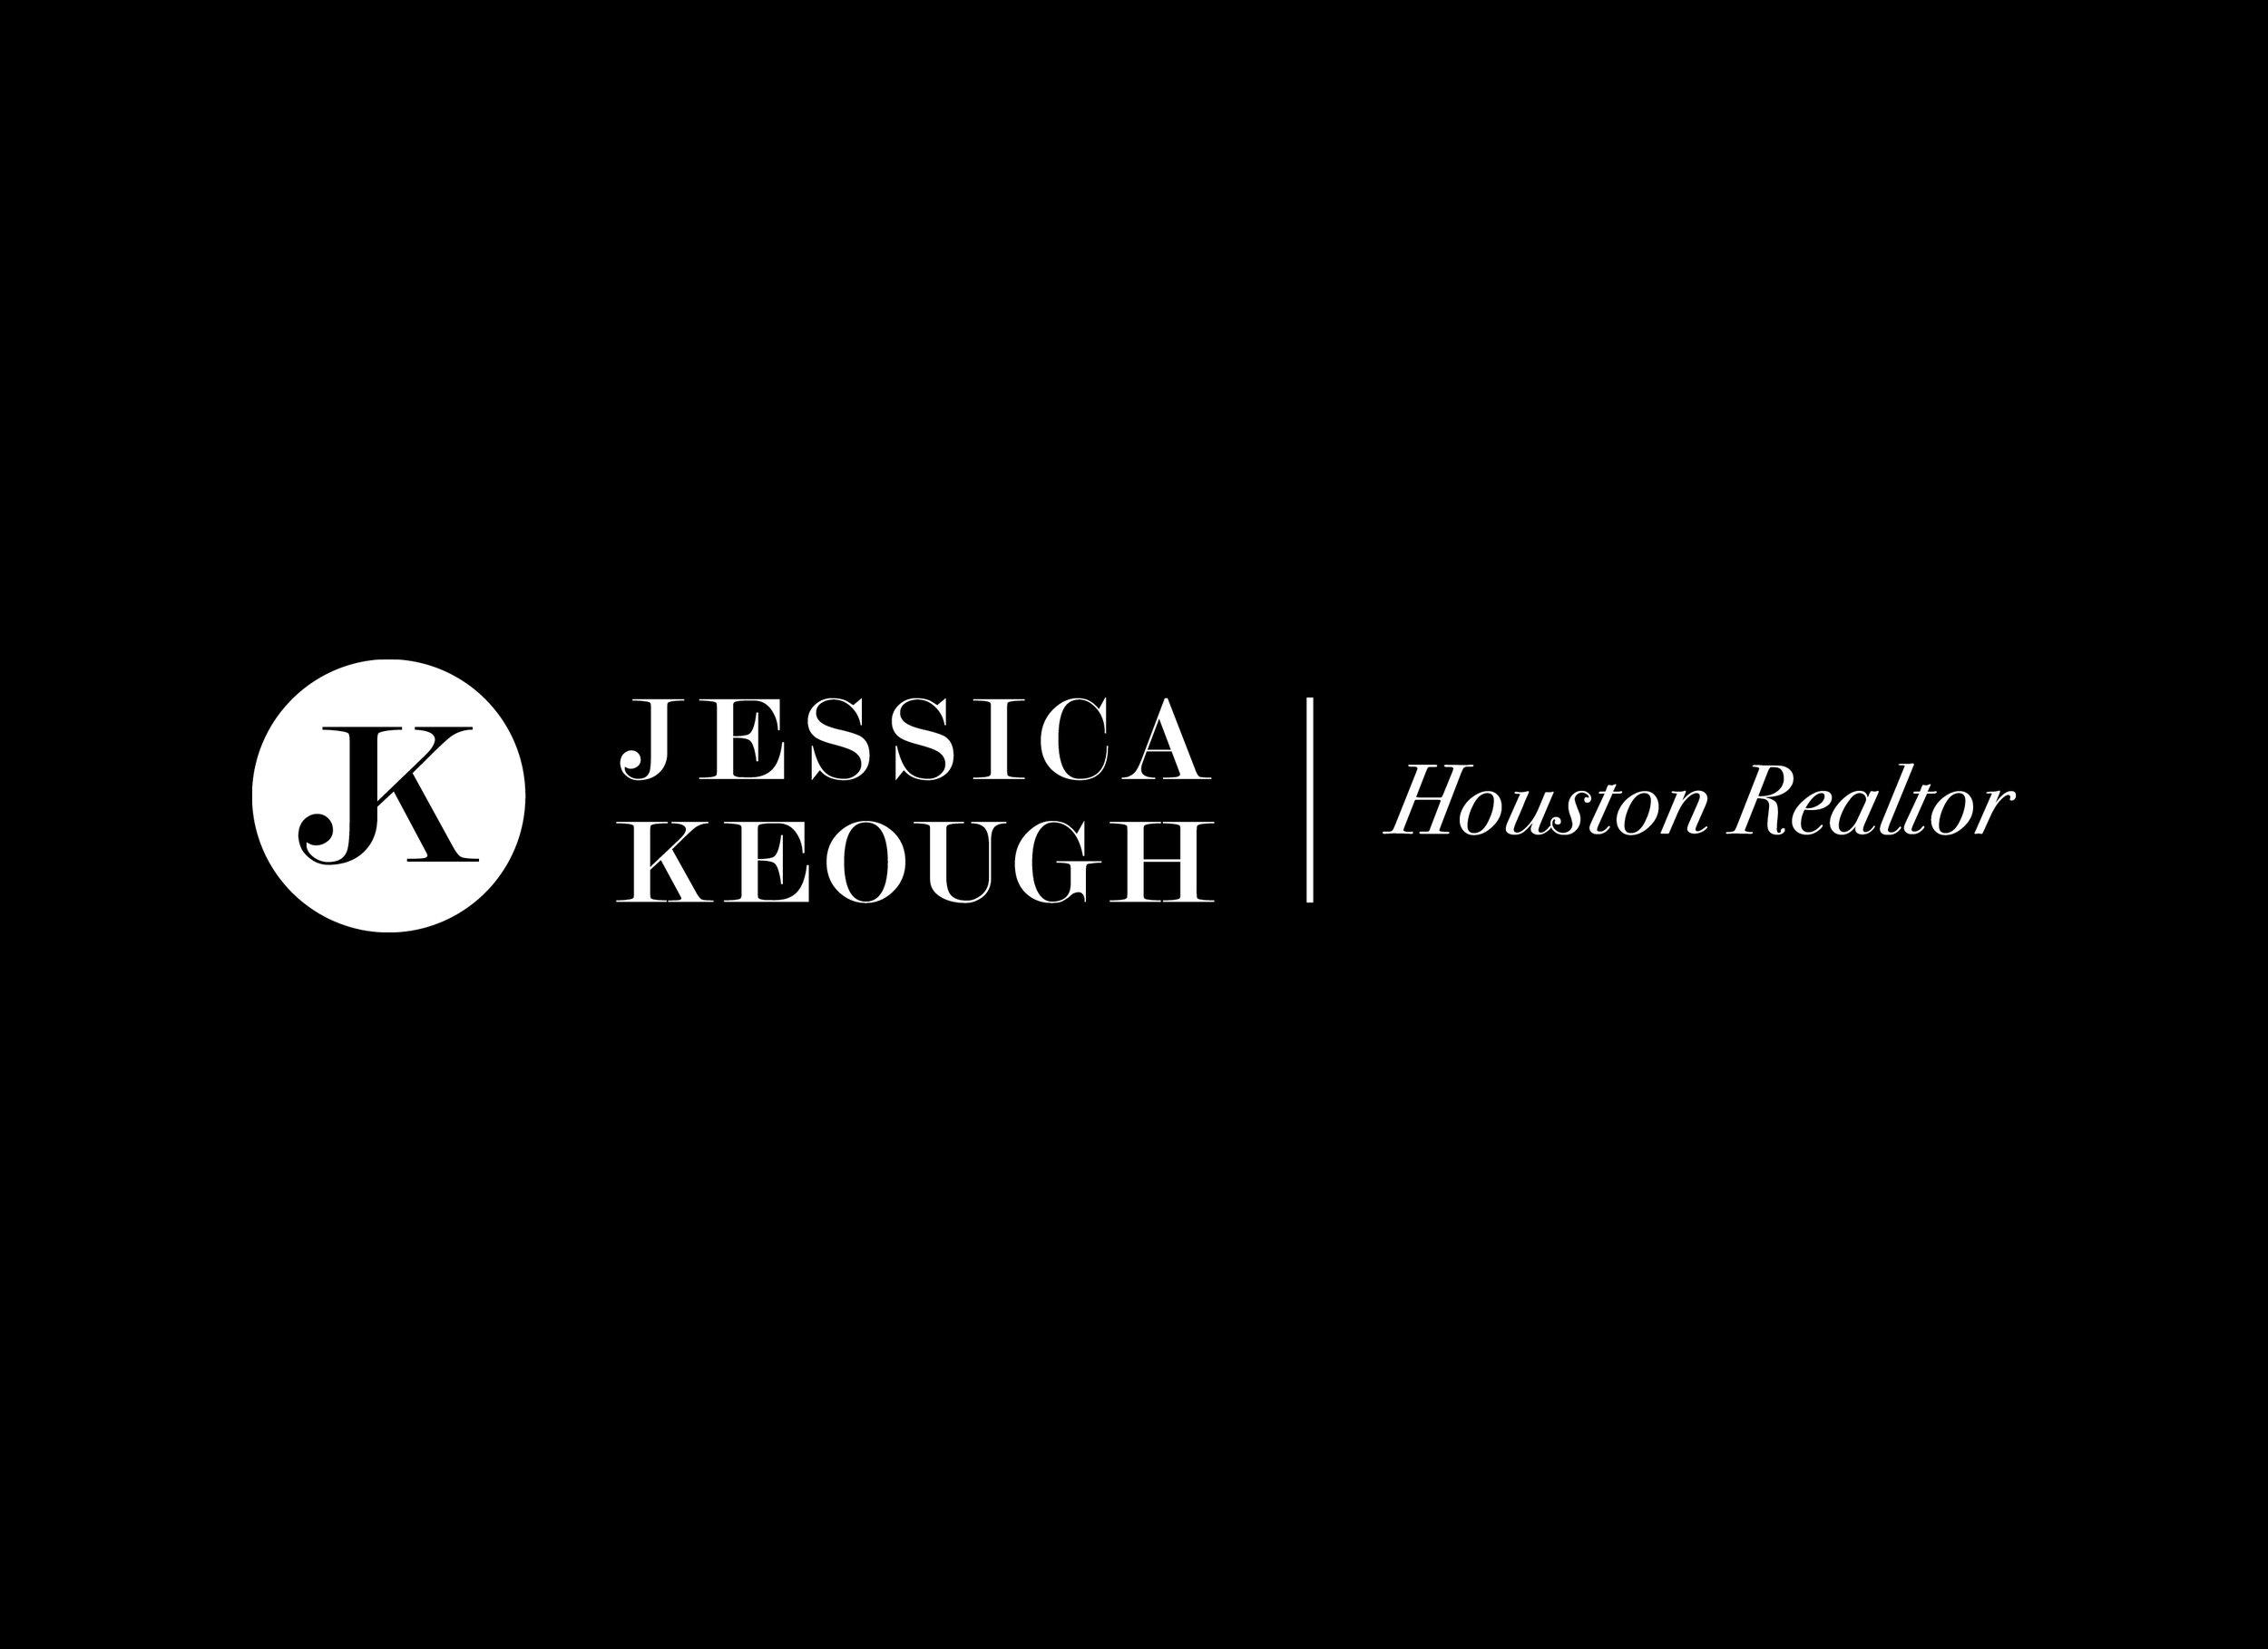 Jessica Keough Realtor5.jpg